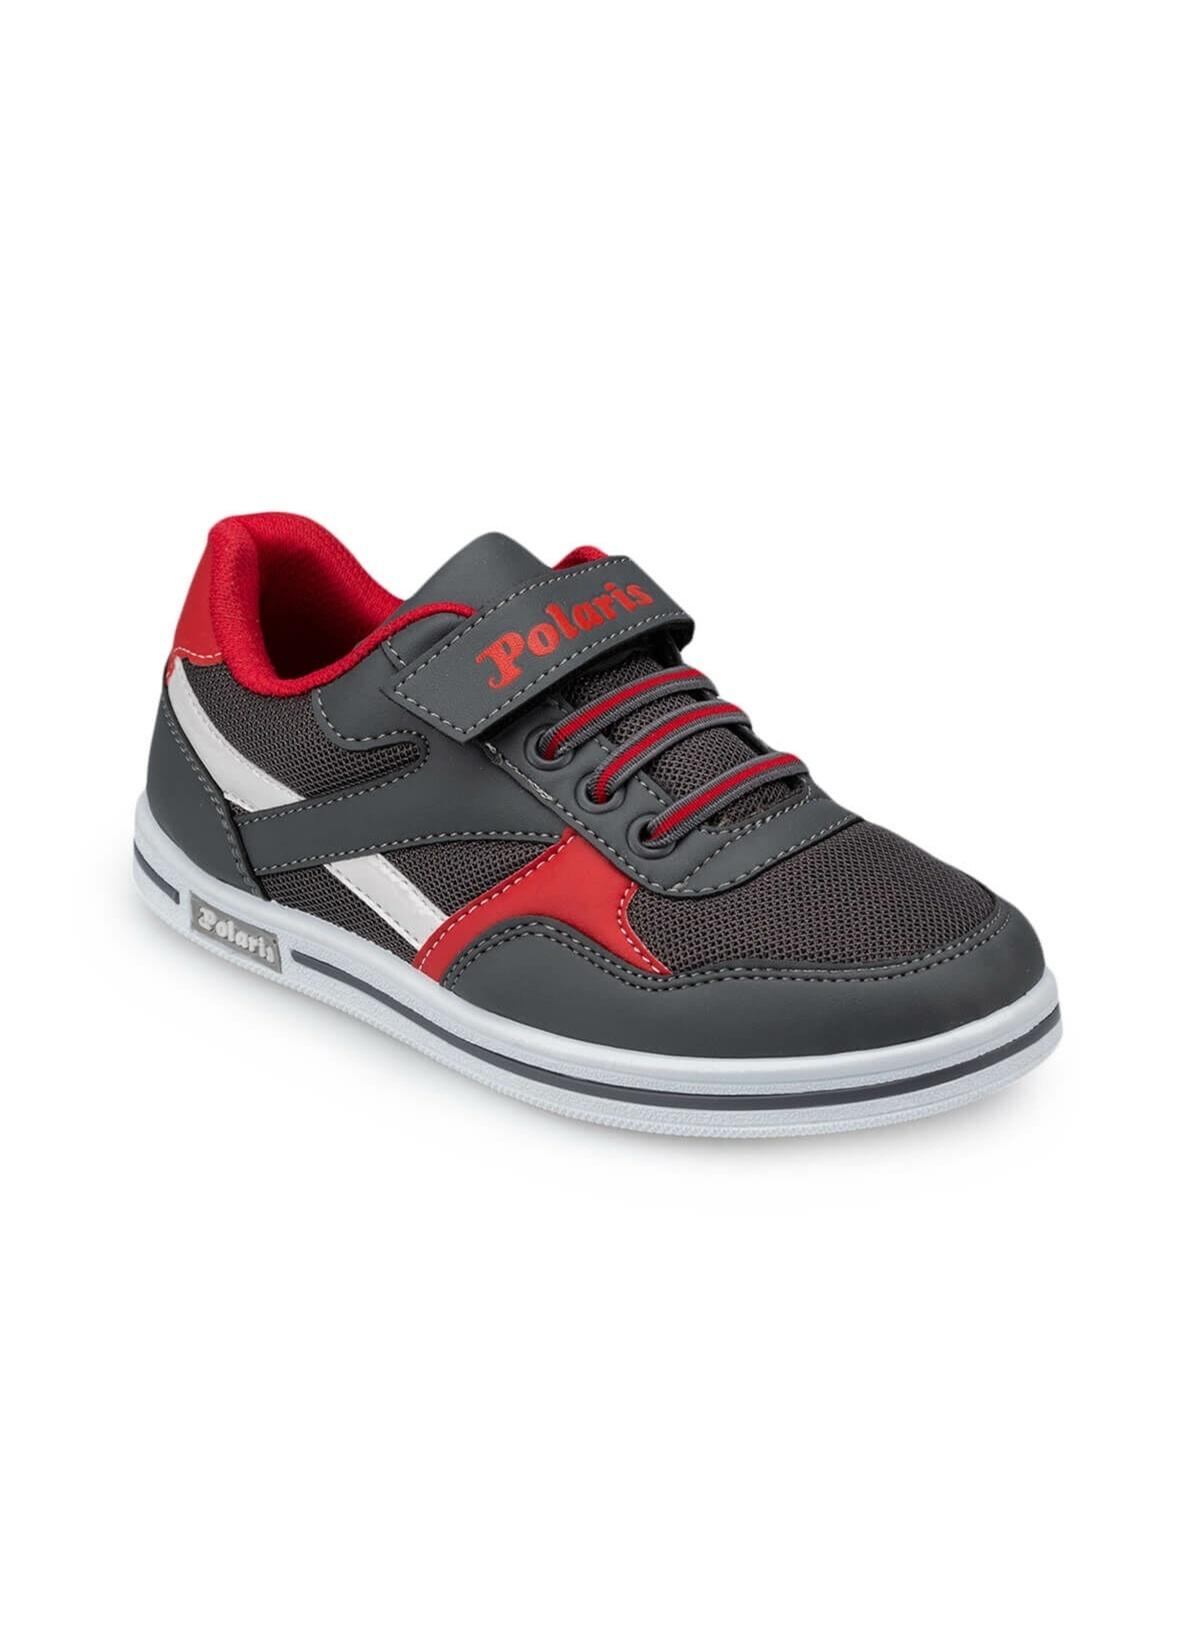 Polaris Sneakers 91.510880.f Sneaker Ayakkabı – 44.99 TL